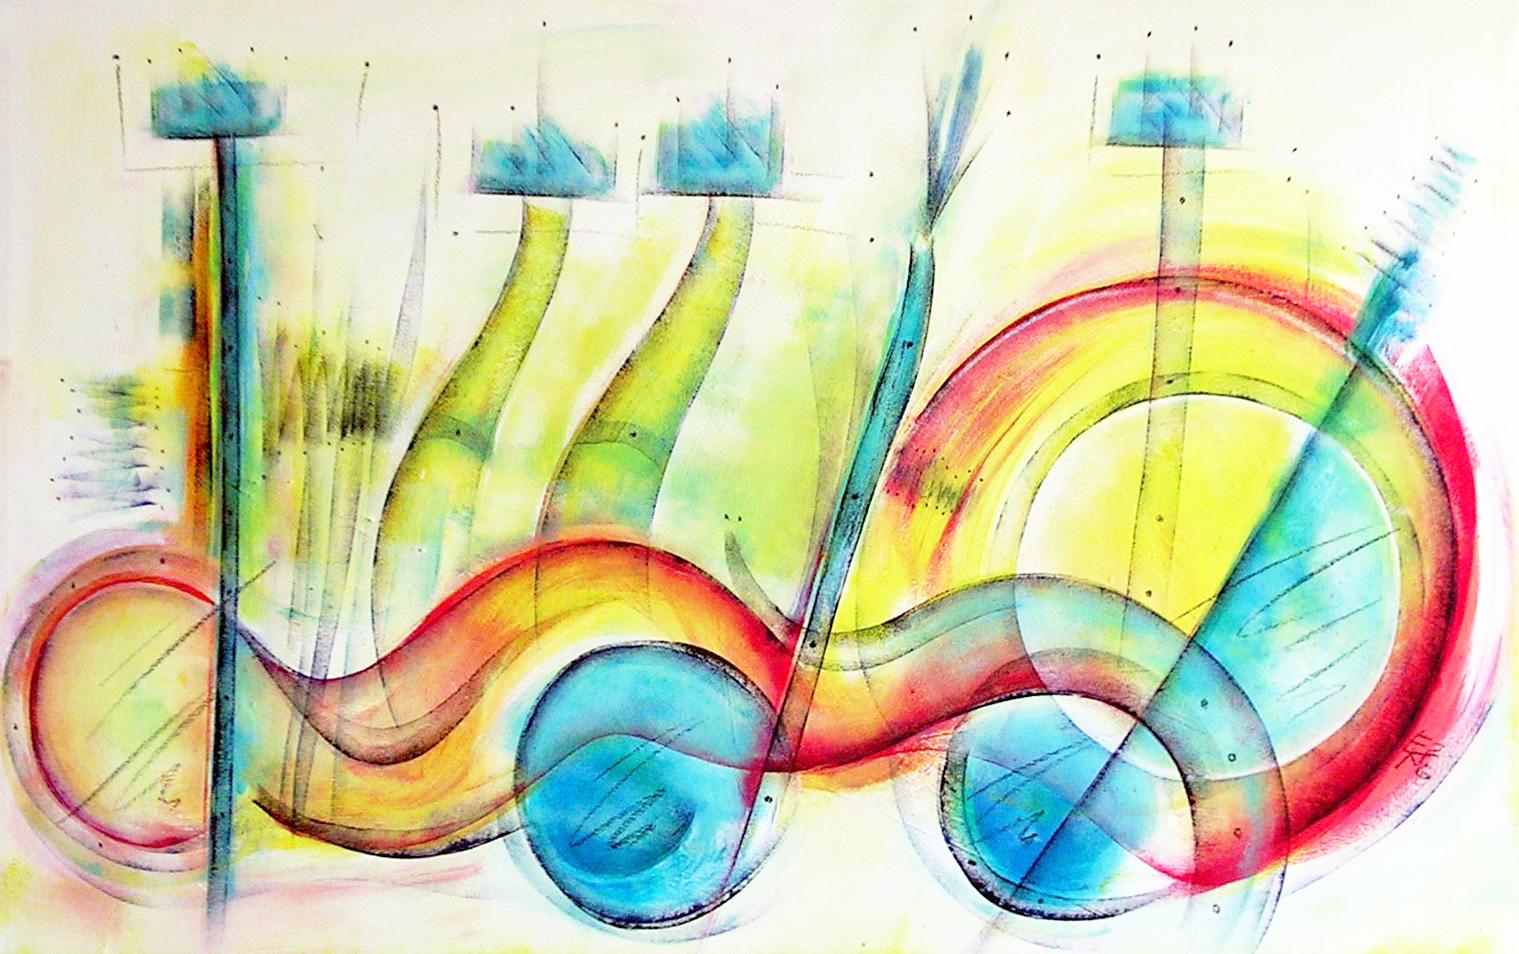 Etelka Kovacs-Koller - über Kreativität - Originalgemälde auf Leinwand